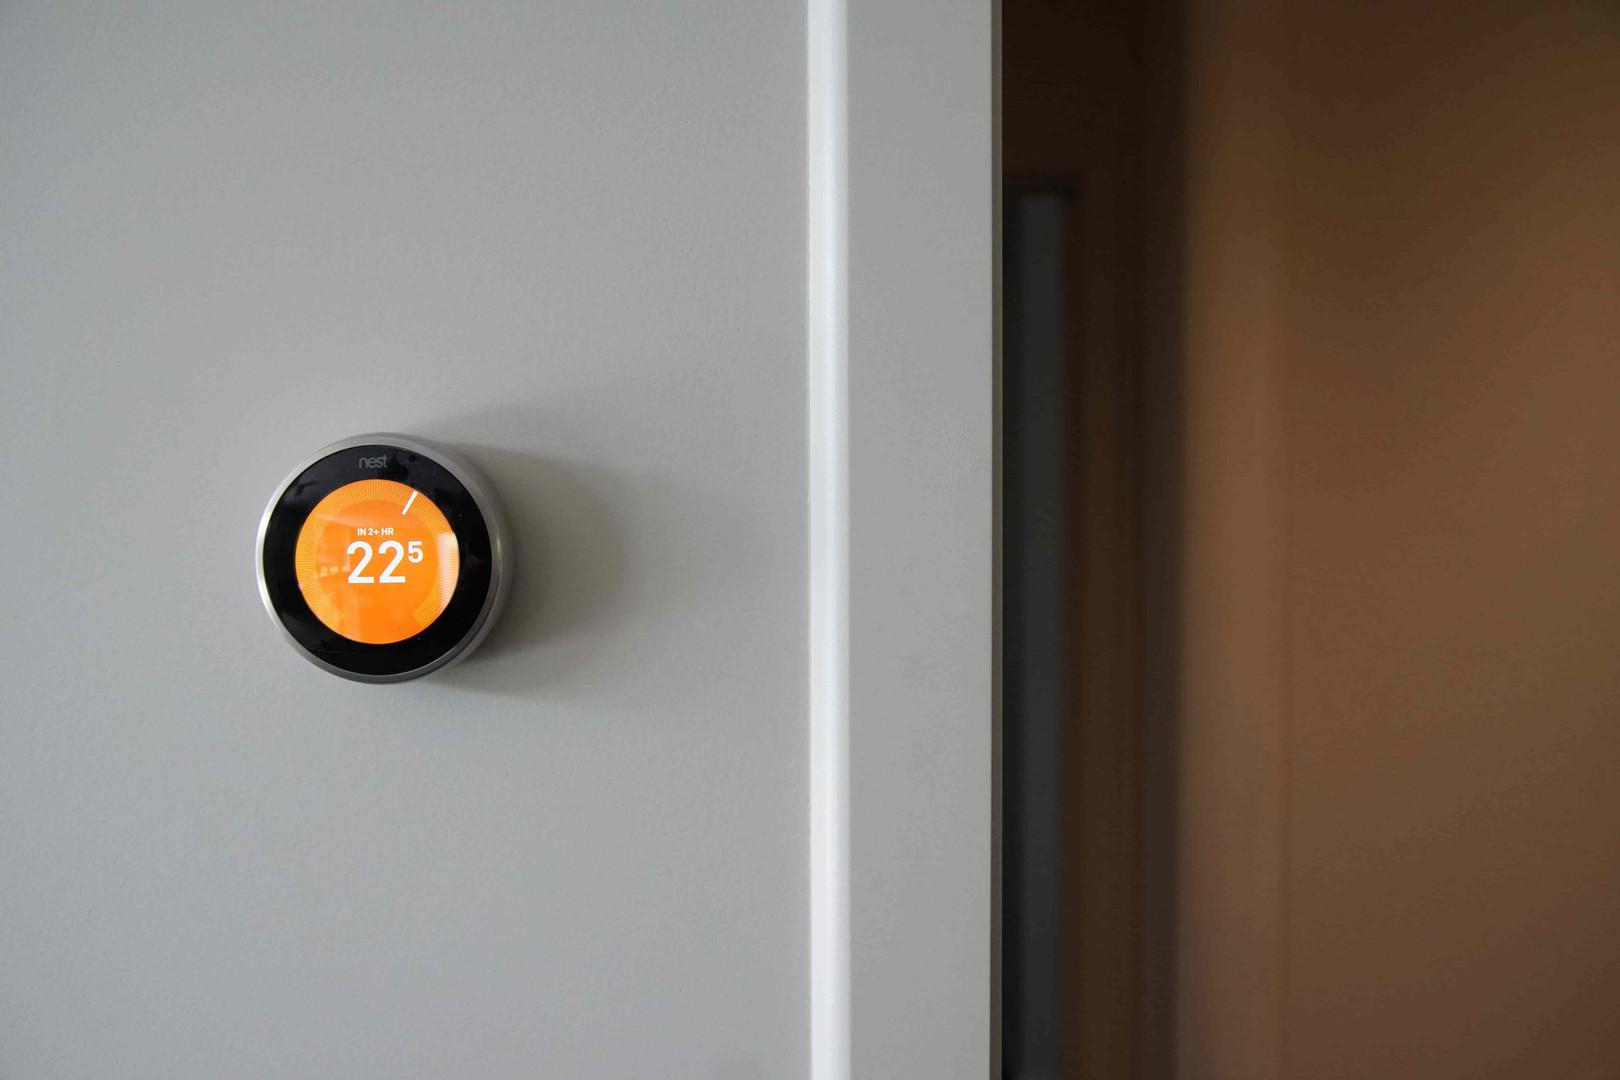 Marshland road Nest smart thermostat